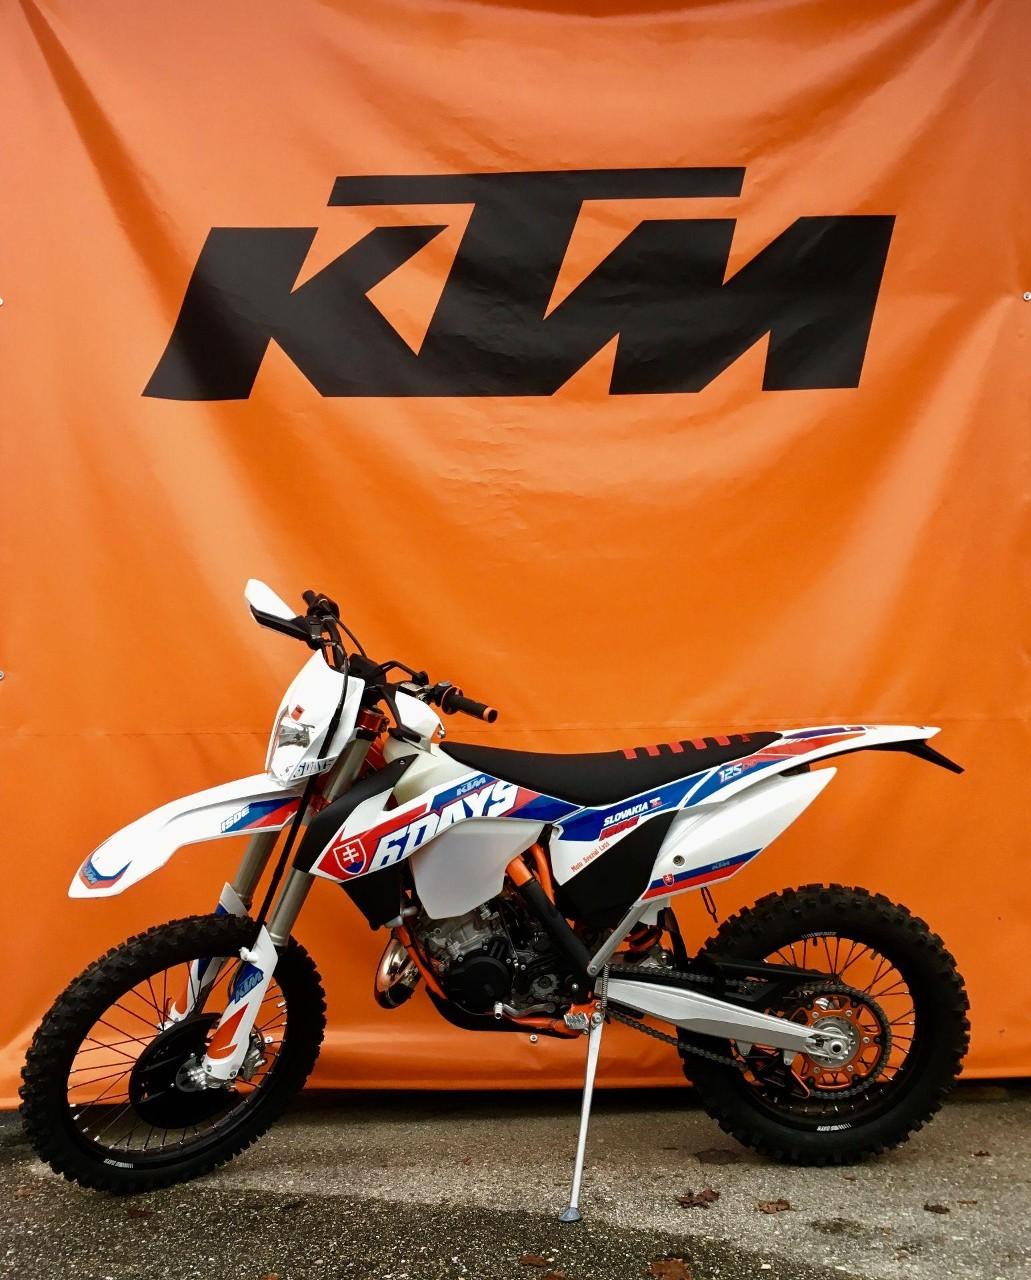 moto occasions acheter ktm 125 exc enduro six days moto. Black Bedroom Furniture Sets. Home Design Ideas